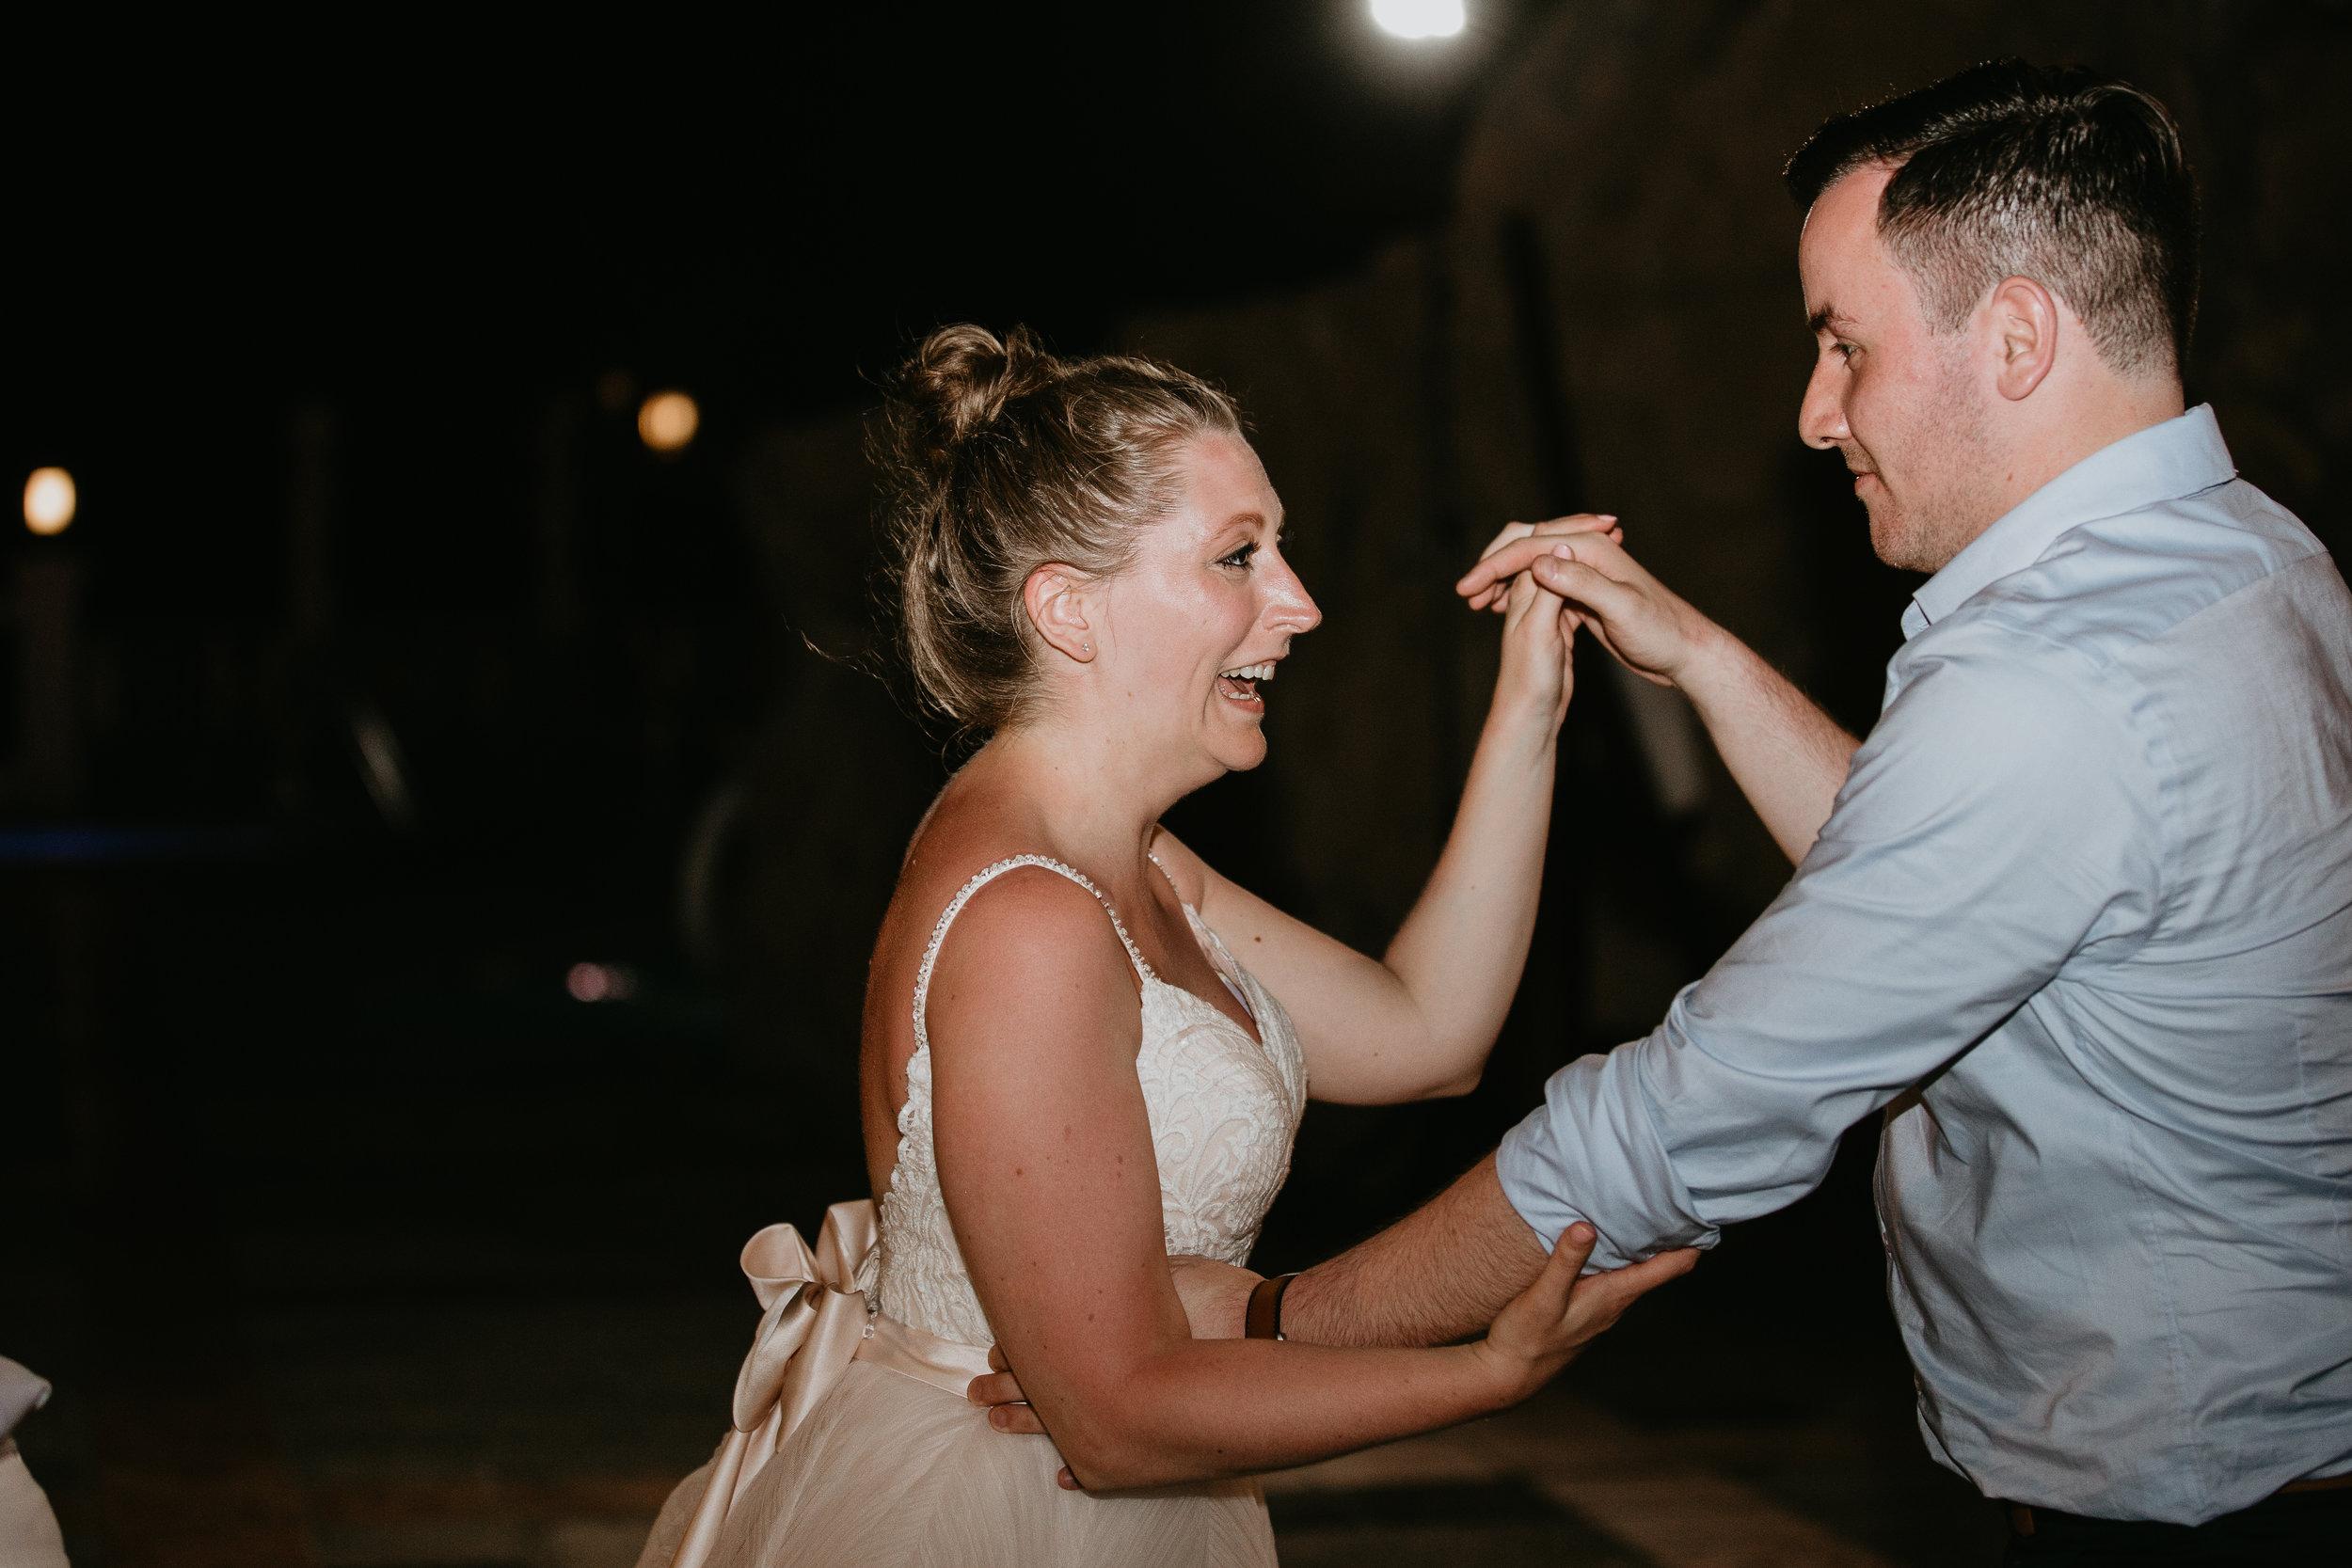 nicole-daacke-photography-destination-wedding-in-st-lucia-sandals-la-toc-intimate-island-wedding-carribean-elopement-photographer-chill-island-wedding-176.jpg